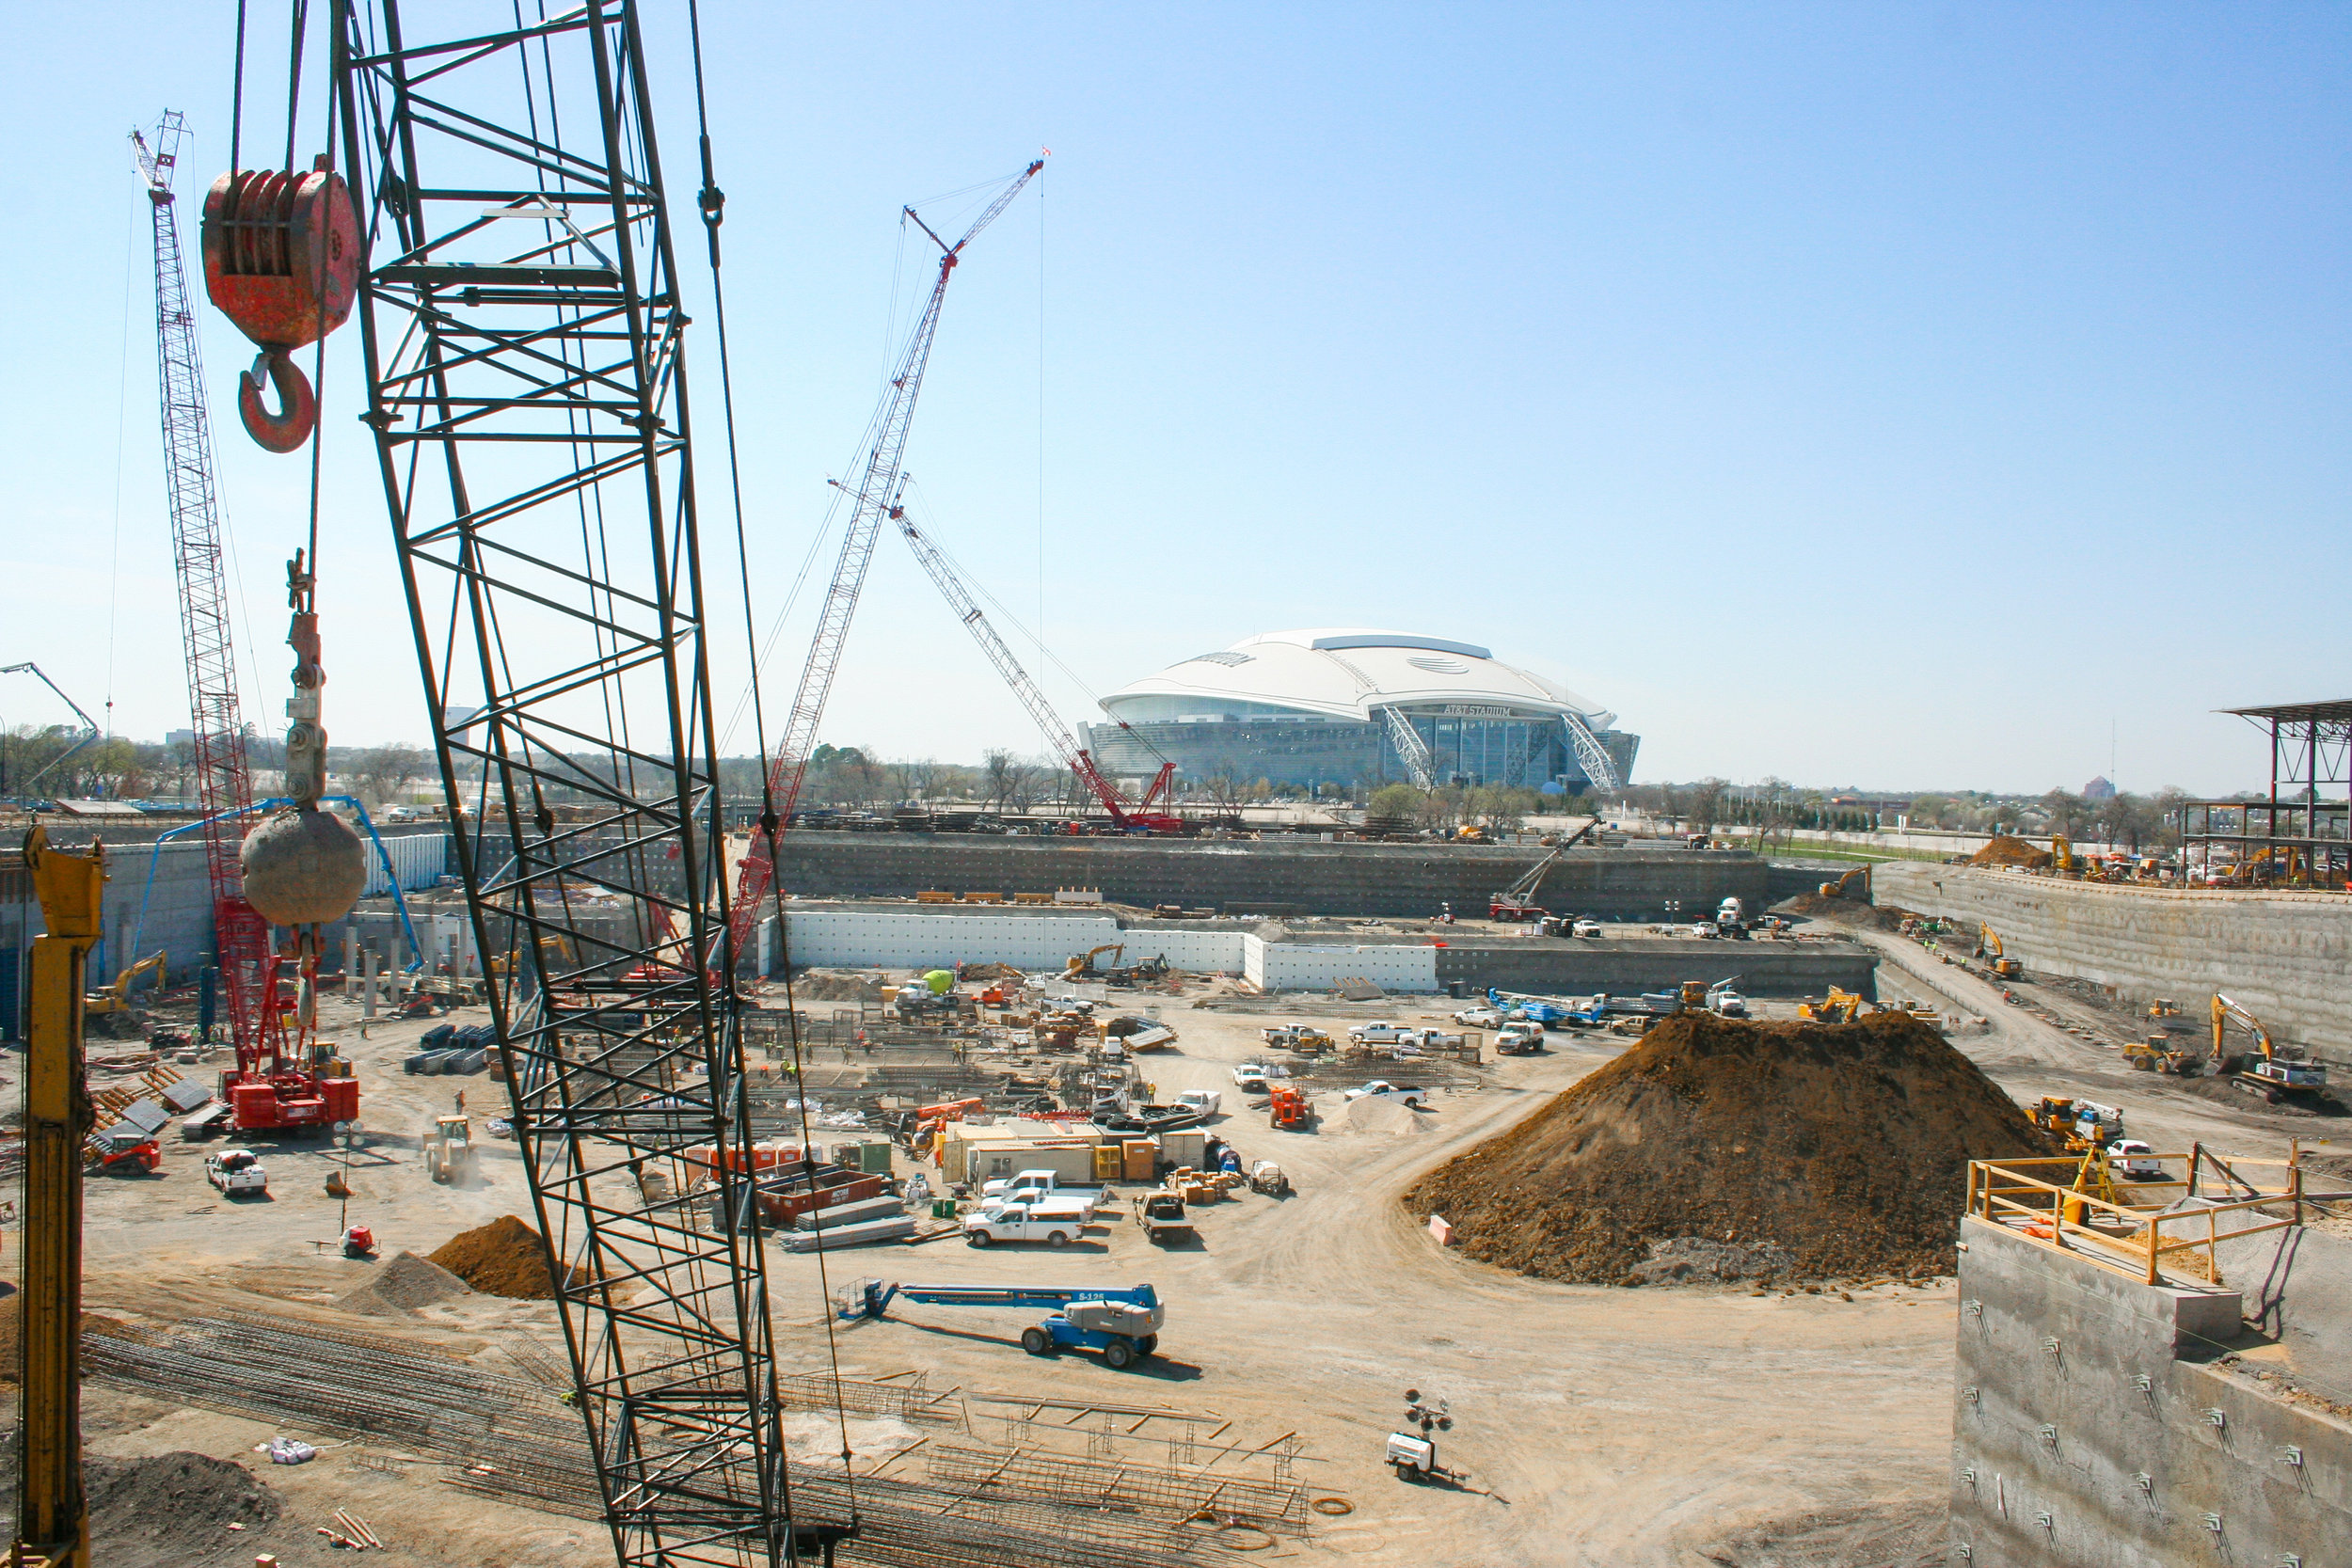 Globe Life Field Texas Ranger Stadium Arlington Texas